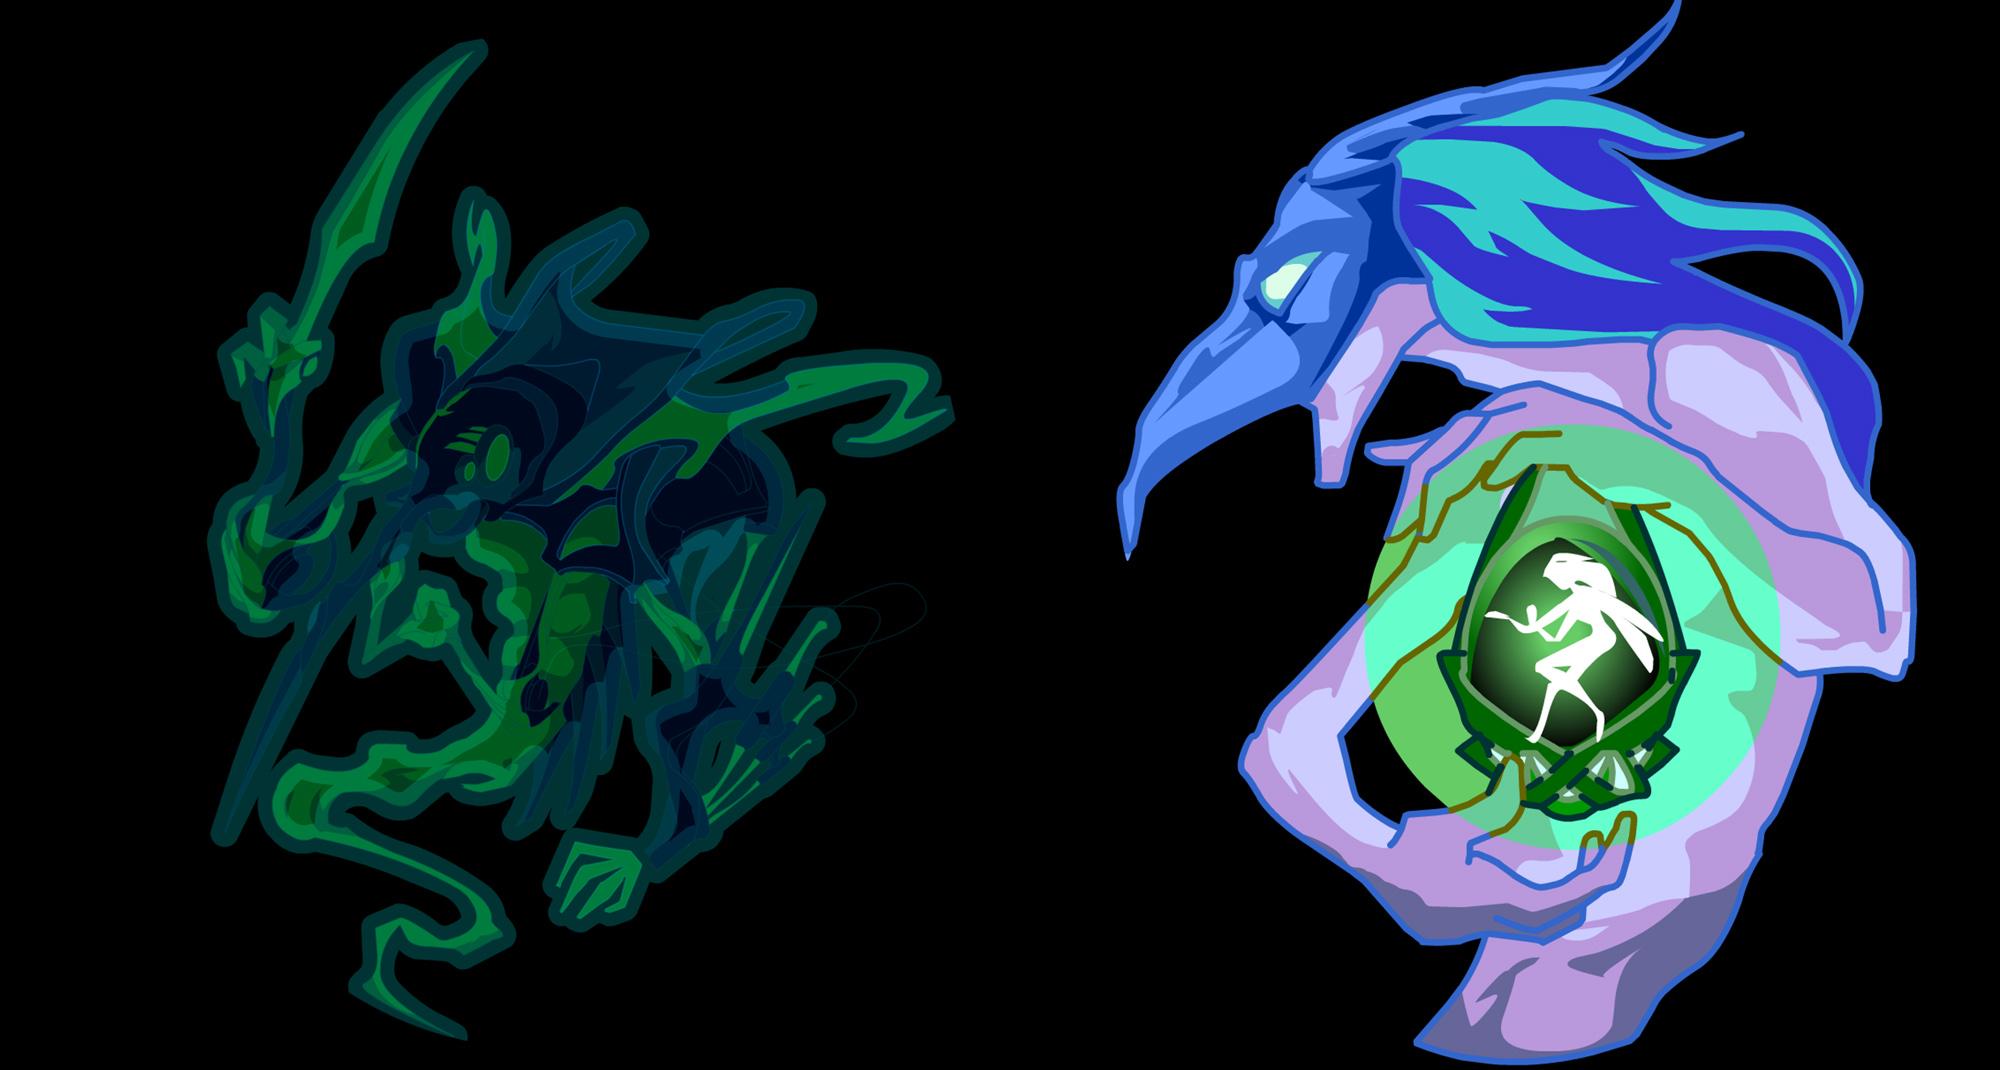 ceo-aliens6.jpg